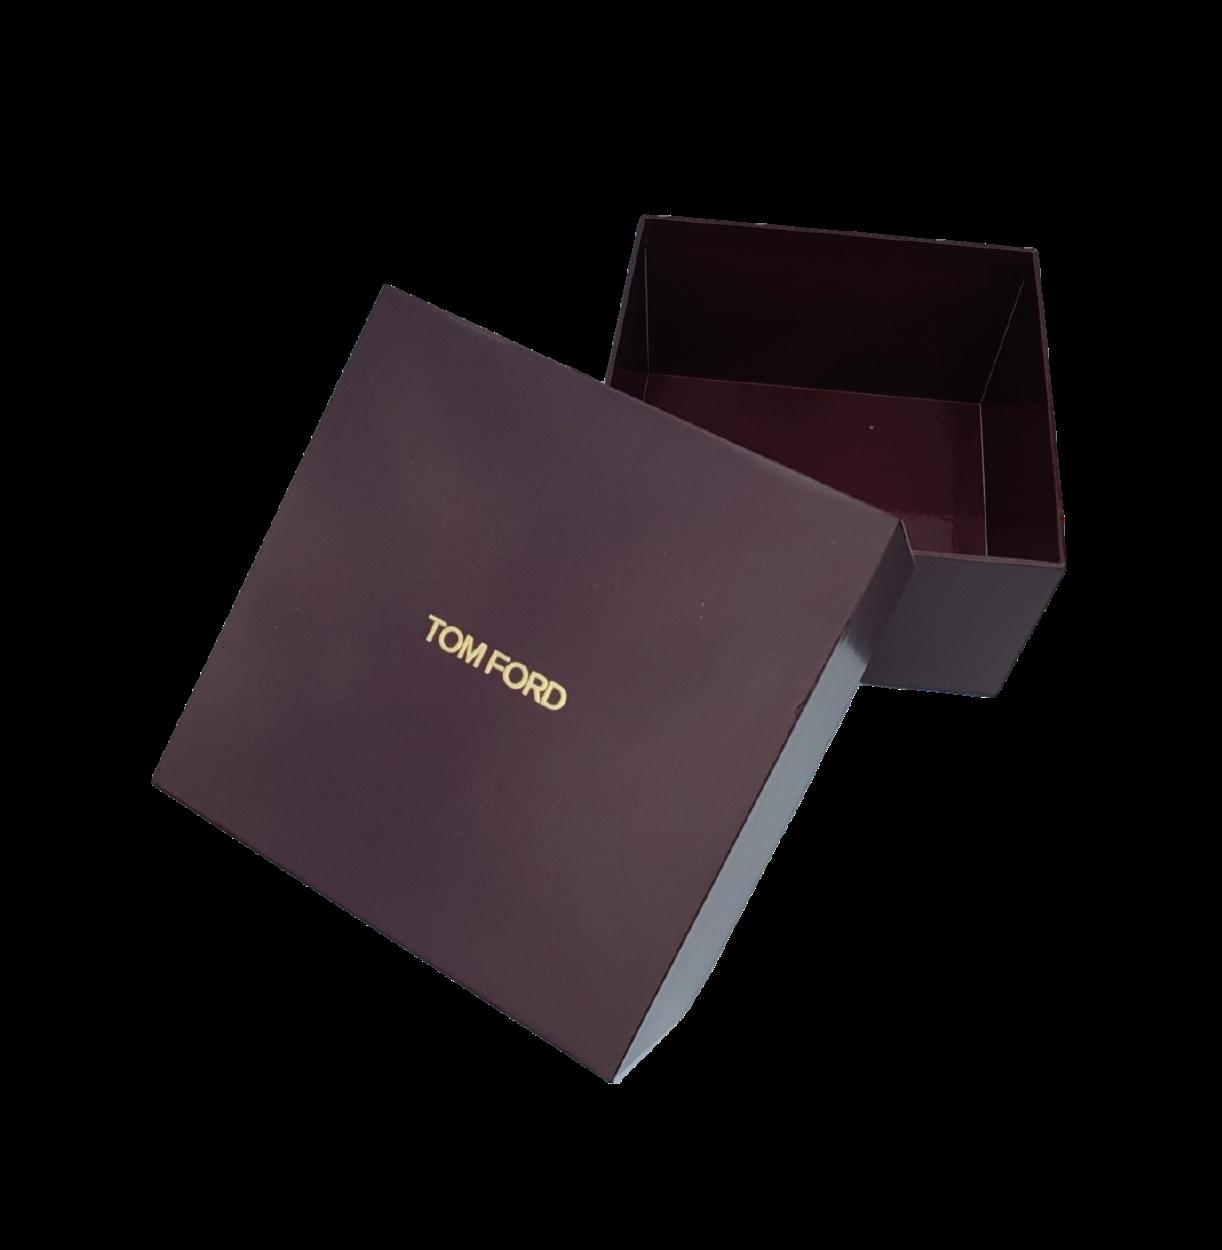 POSM - Square Box